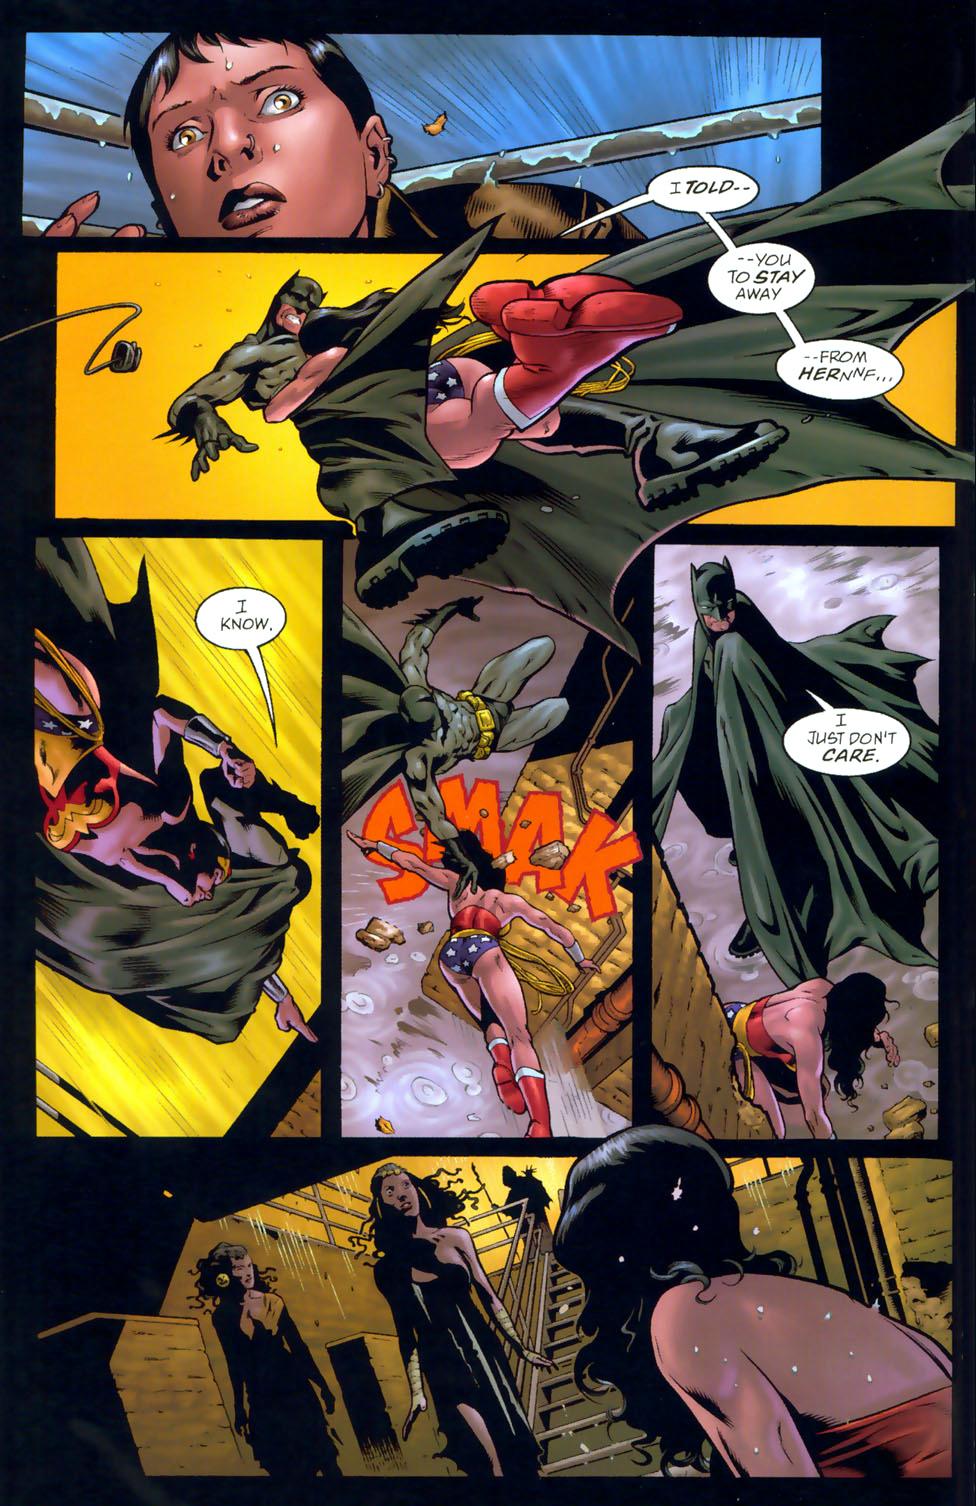 Do batman and wonder woman ever hook up